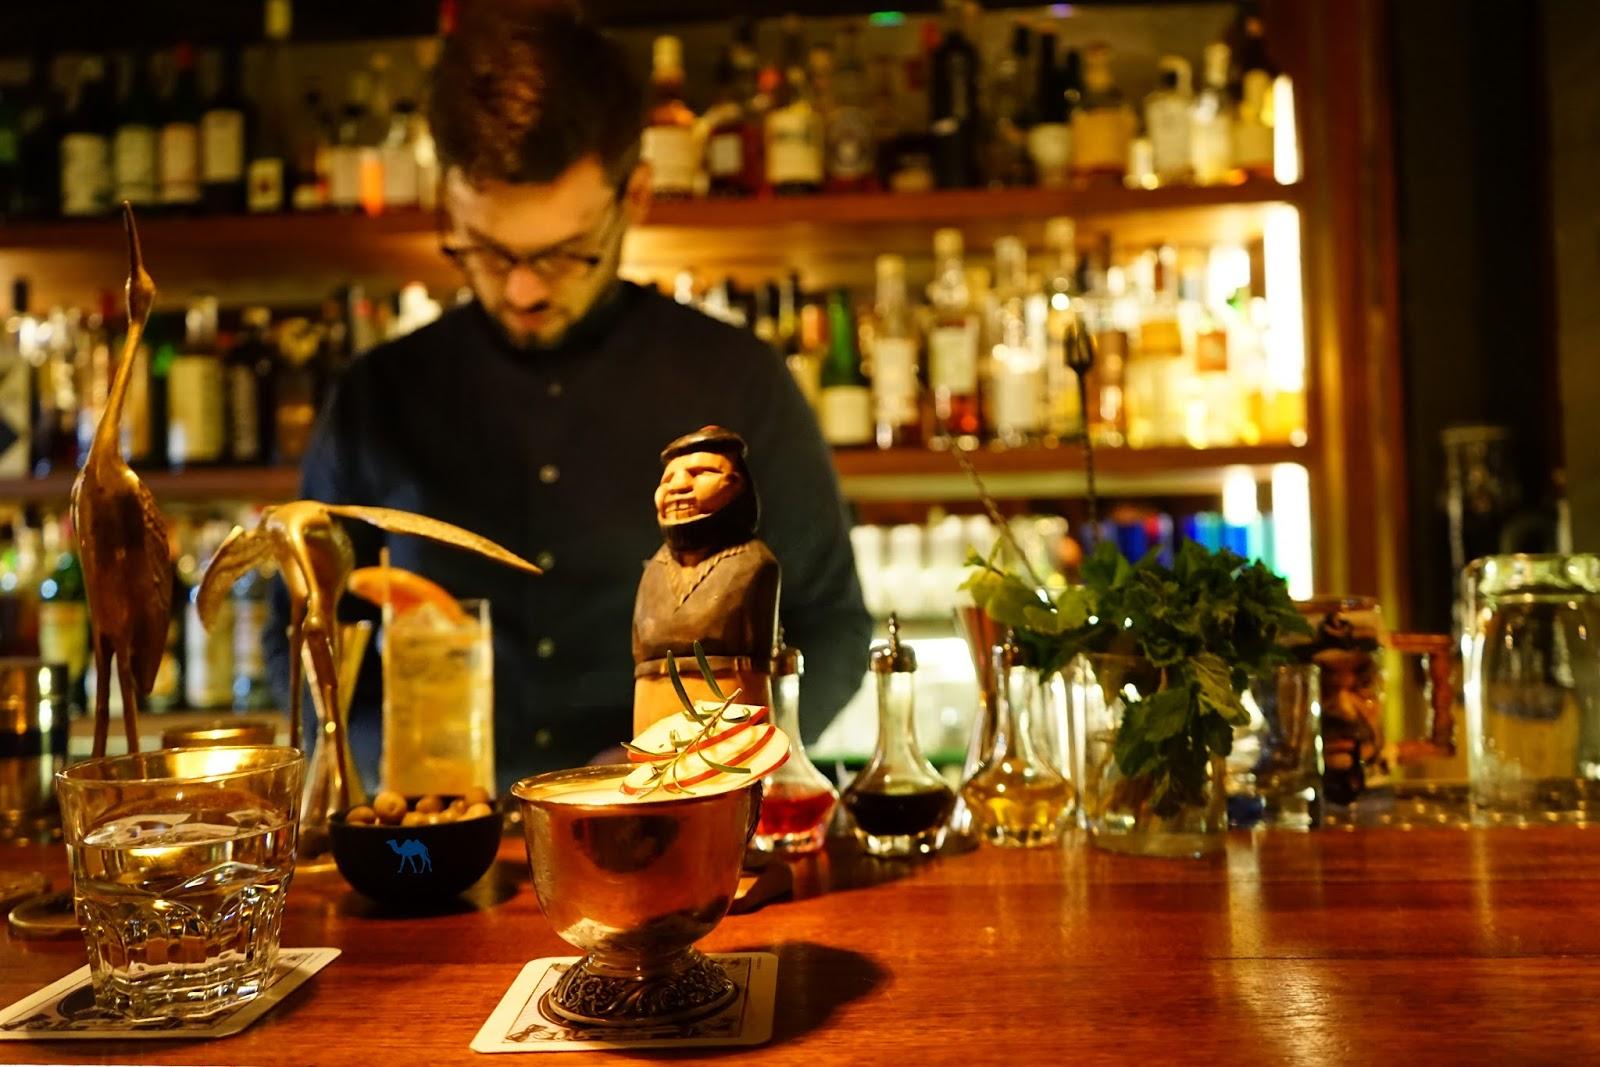 Le Chameau Bleu  - Blog Voyage Gand Belgique - Bar du Jiggers Bar à Cocktail Gand Belgique Ghent Gent